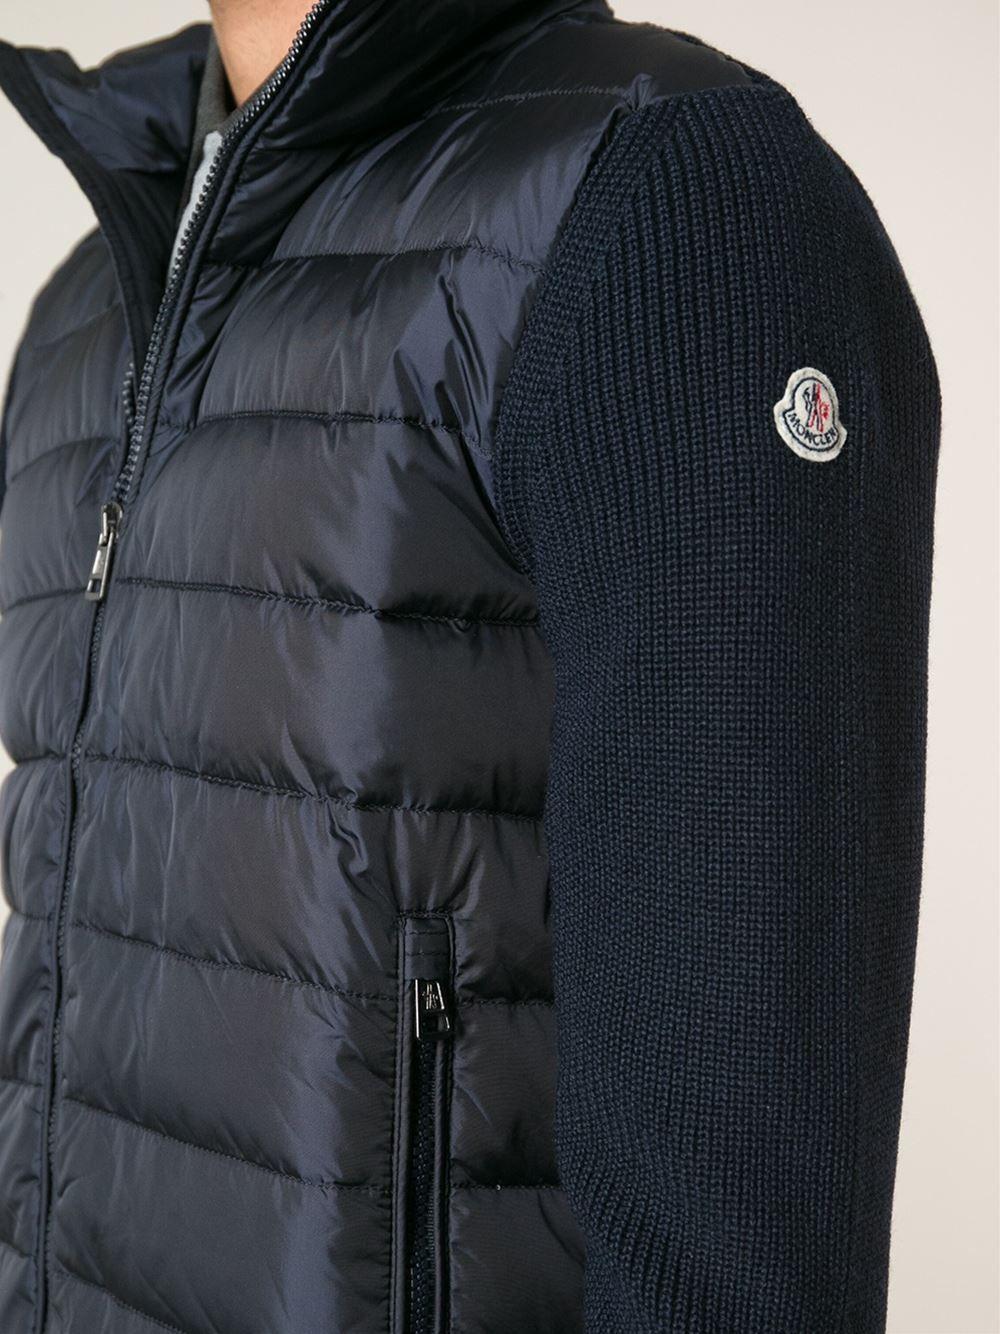 #moncler #jacket #navy #new #men #fahion #style  www.jofre.eu